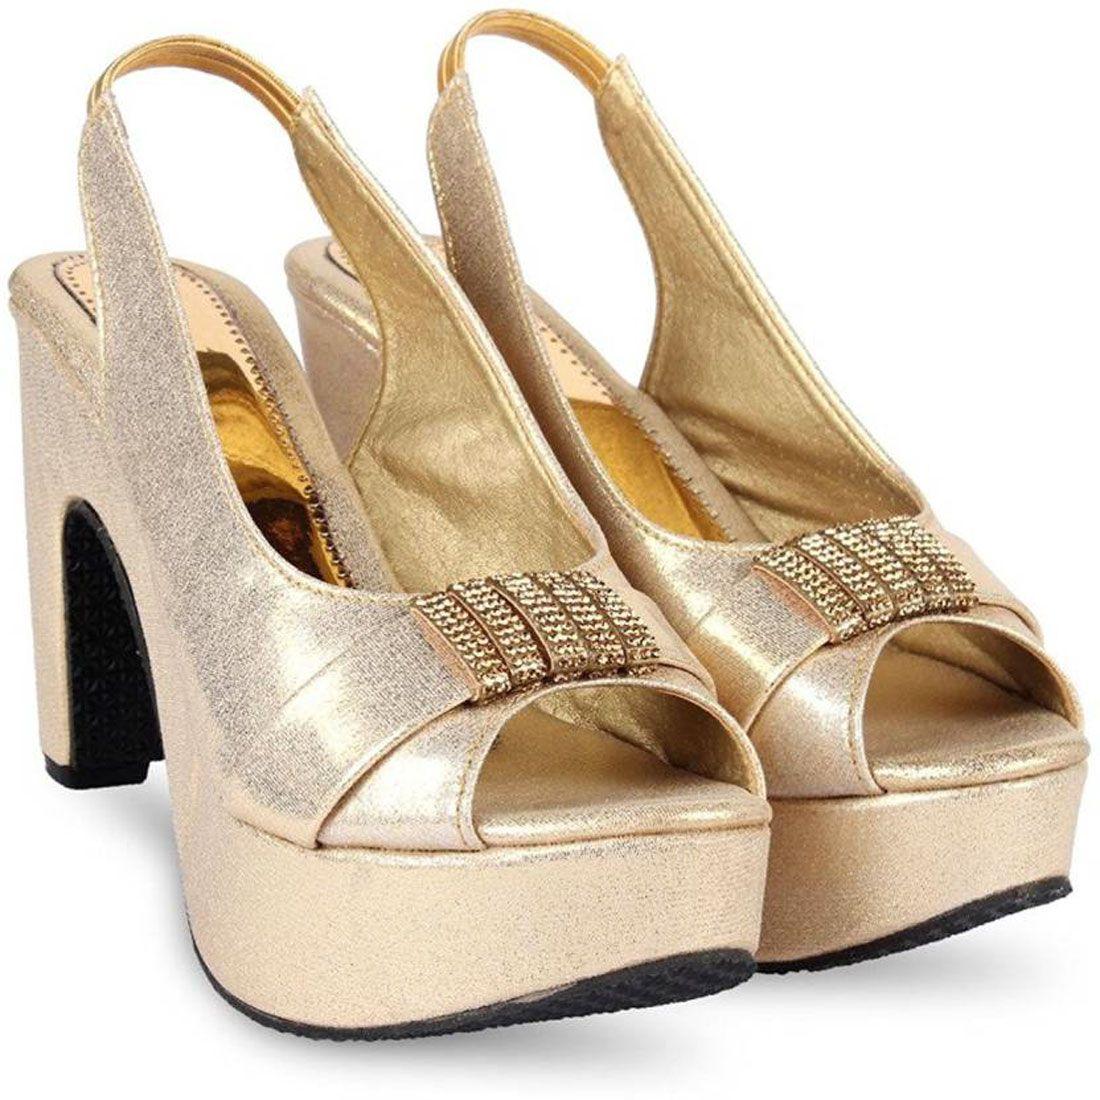 Radhika Gold Cone Heels